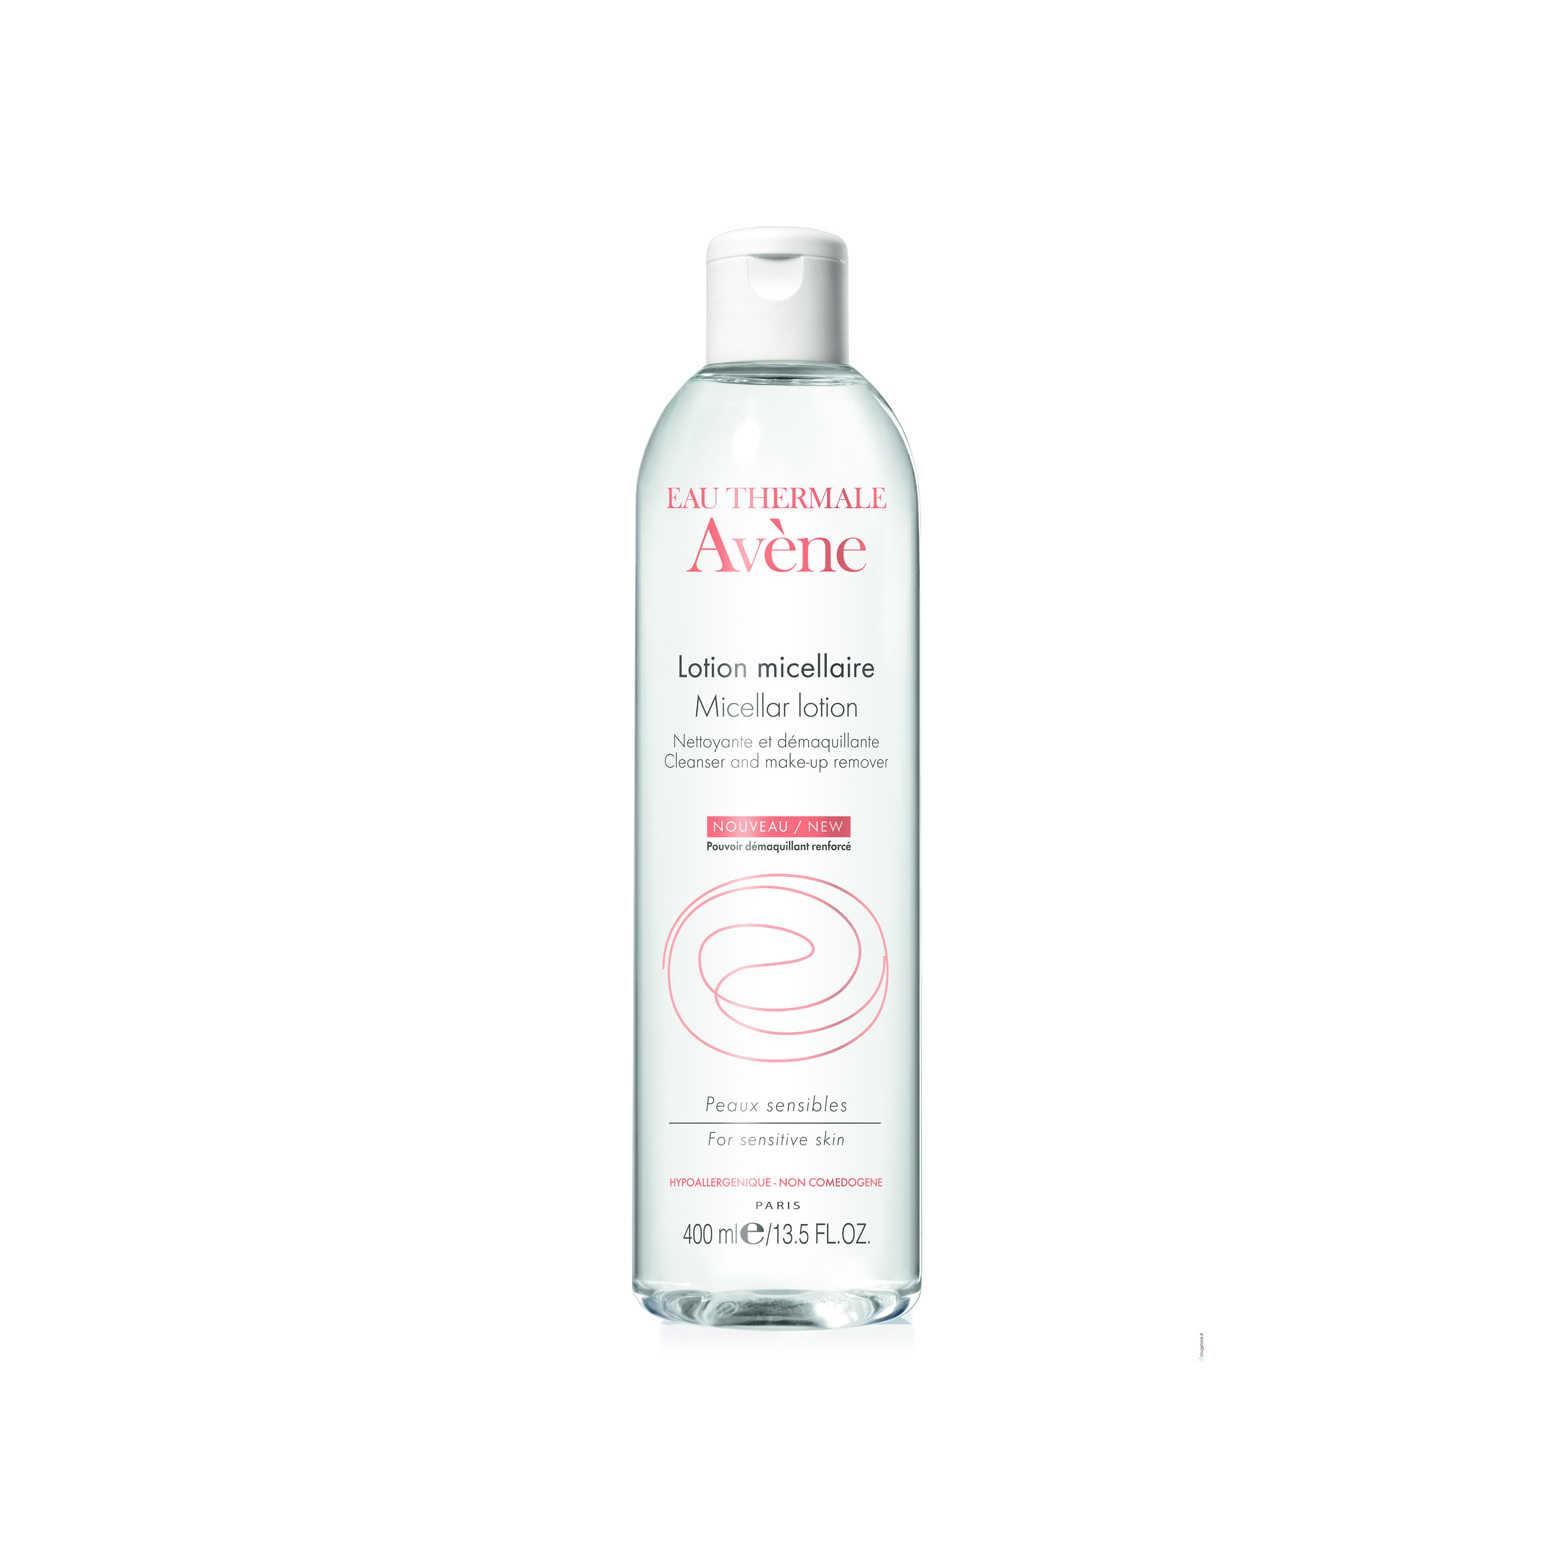 Avene - Soluzione Micellare Detergente - 400ml